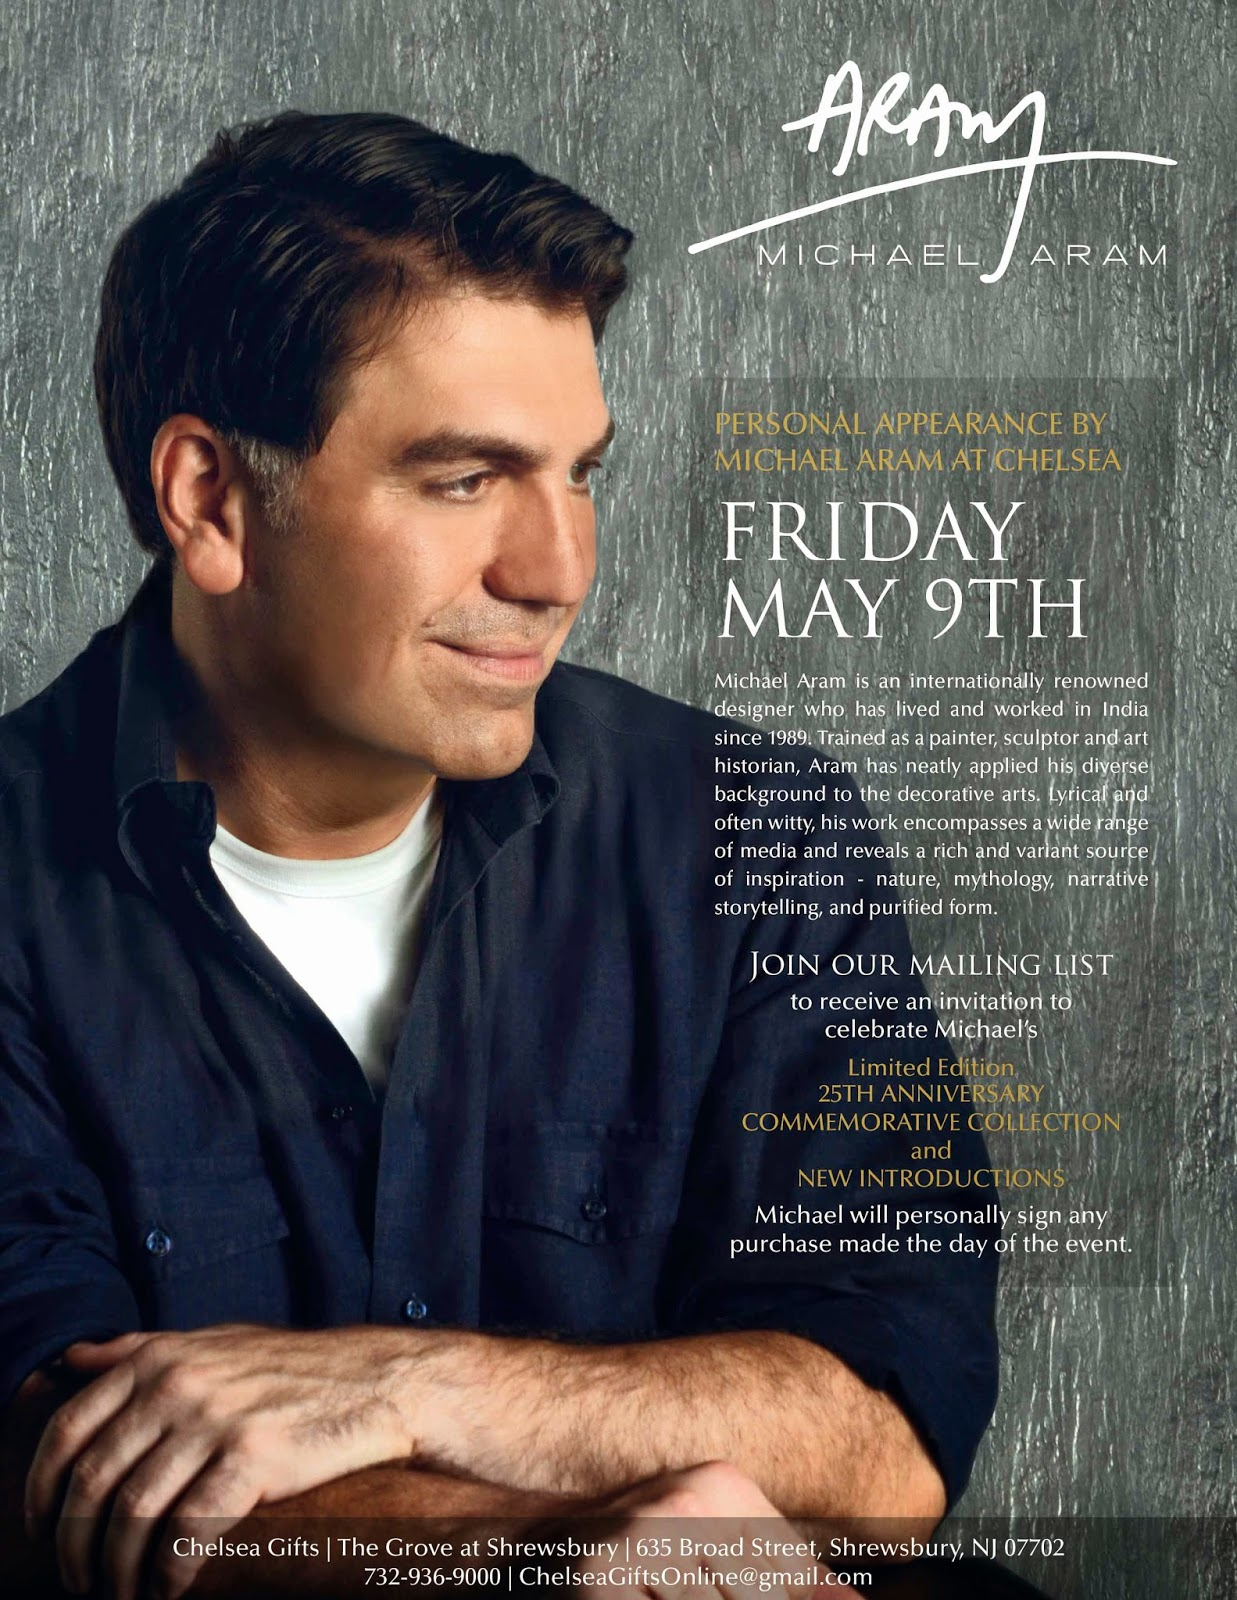 Michael Aram 25th Anniversary Poster